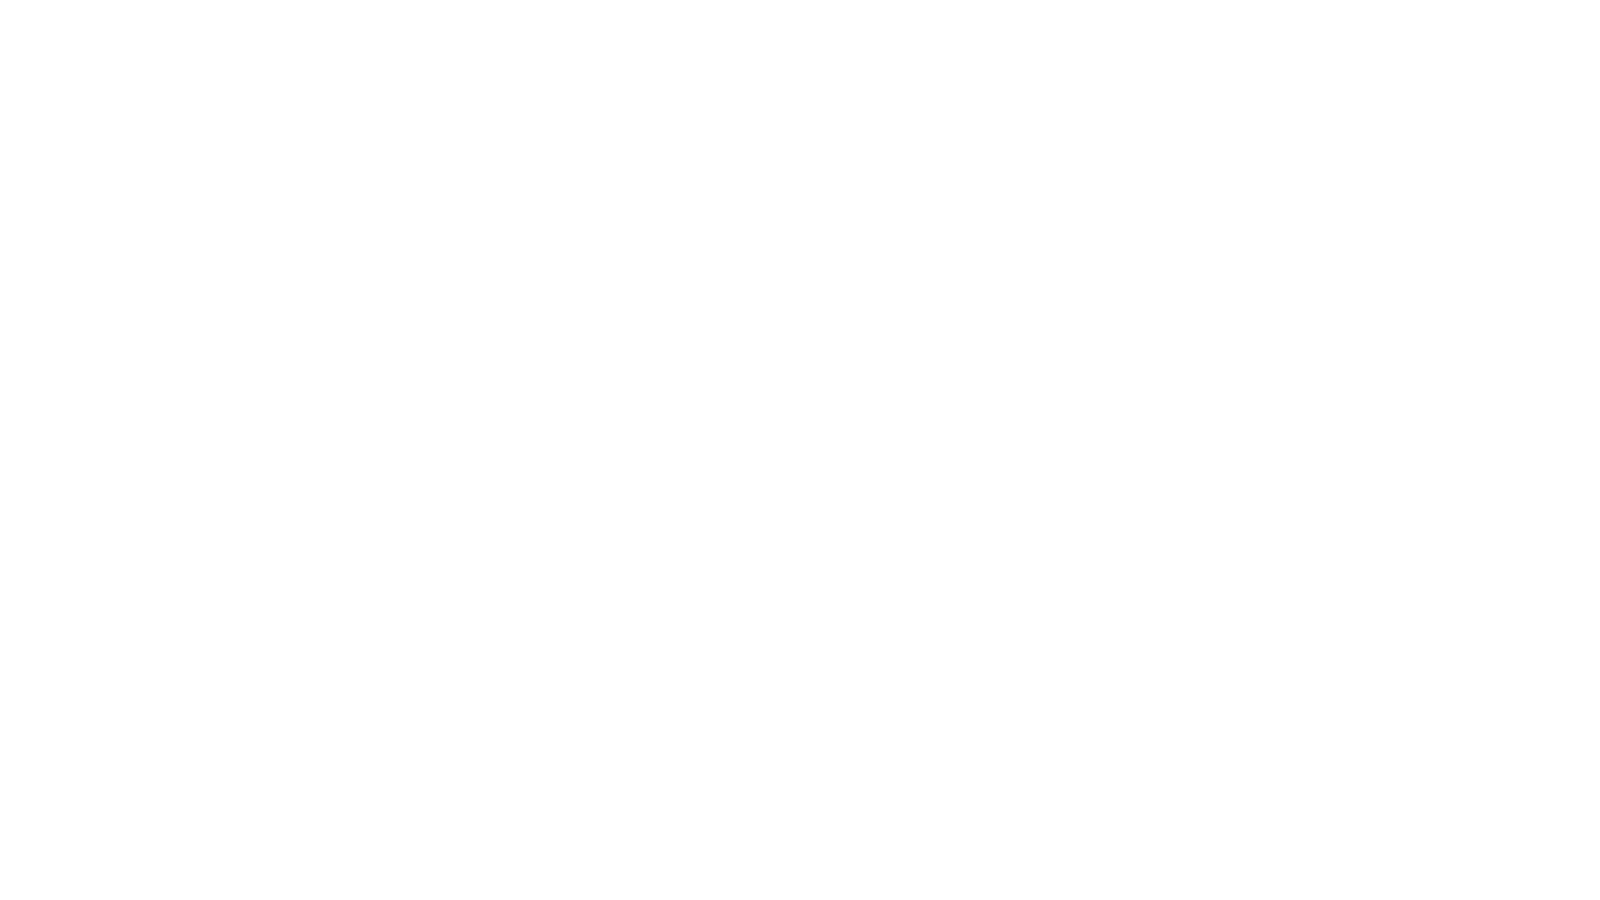 Halo, #SobatSMP! 👋🏻  Kalian tahu gak, sih, SMA Pradita Dirgantara?  SMA yang satu ini adalah SMA untuk menyiapkan generasi emas Indonesia melalui penguasaan sains, kedewasaan mental, kebebasan berkreativitas, kemandirian, dan wawasan kedirgantaraan. Cocok banget nih buat kalian yang ingin terjun ke dunia dirgantara.  SMA Pradita Dirgantara merupakan sekolah unggulan binaan TNI AU melalui Yayasan Ardhya Garini yang terletak di Komplek Lanud Adi Sumarno, Solo, Jawa Tengah. SMA ini berkonsep boarding school dengan seluruh siswa mendapat beasiswa penuh hingga selesai pendidikan.  Yuk, simak profil singkat SMA Pradita Dirgantara ini dan untuk kalian yang tertarik bisa langsung kunjungi instagram-nya: @smapraditadirgantara. 😊